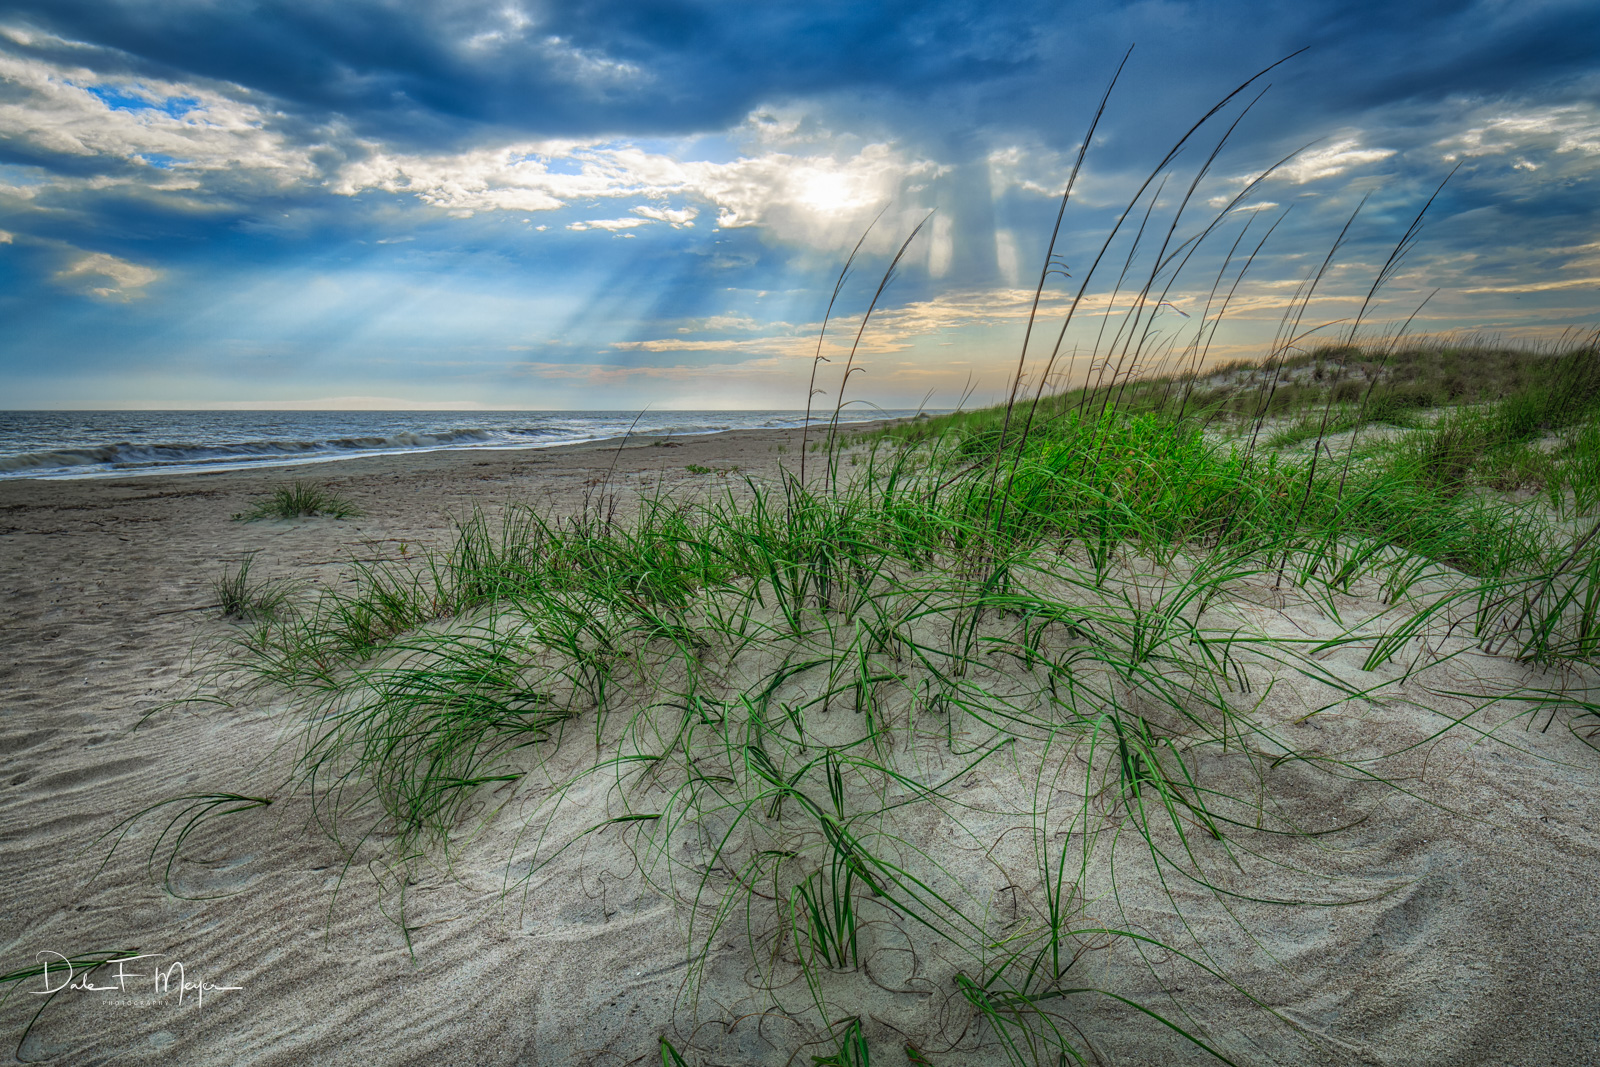 Coastal Photos from the Eastern Seaboard Gallery, Crepuscular rays, Oak Island  NC Sand dunes, Sea Grass, photo